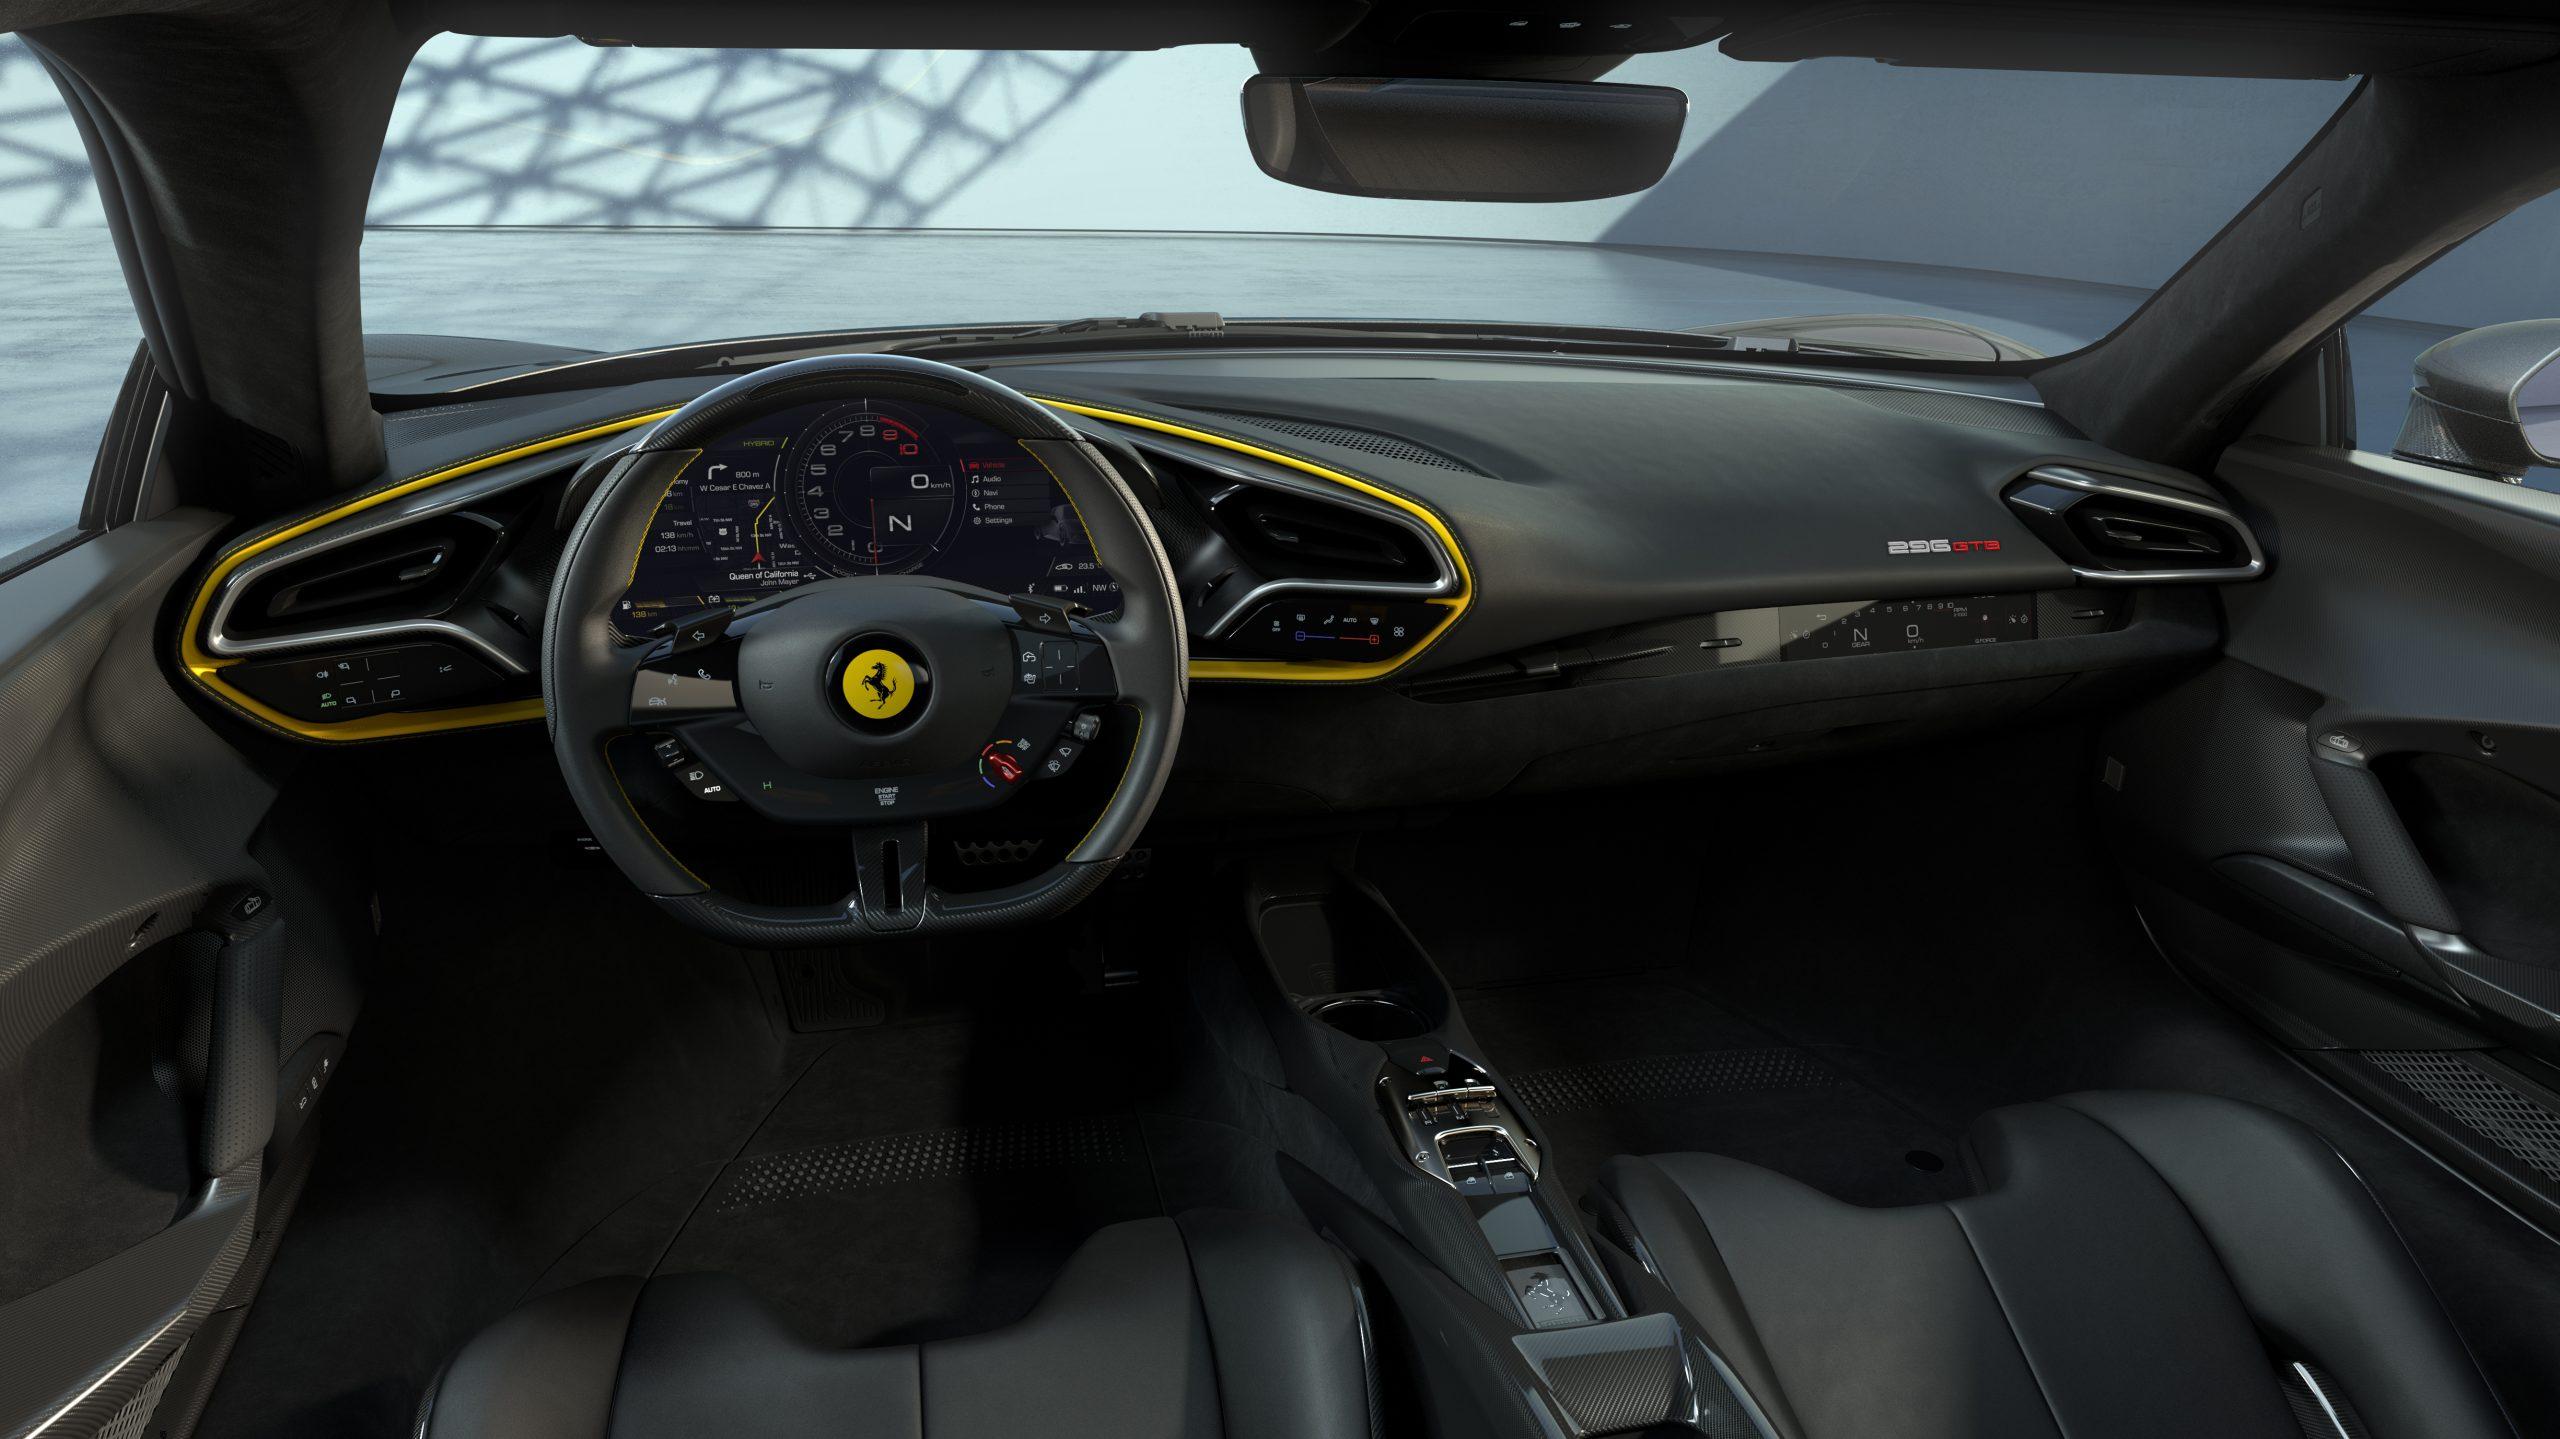 05 296 GTB Assetto Fiorano interior 34 scaled Αυτή είναι η νέα Ferrari 296GTB 296GTB, Ferrari, Ferrari 296GTB, supercar, supercars, zblog, ειδήσεις, Νέα